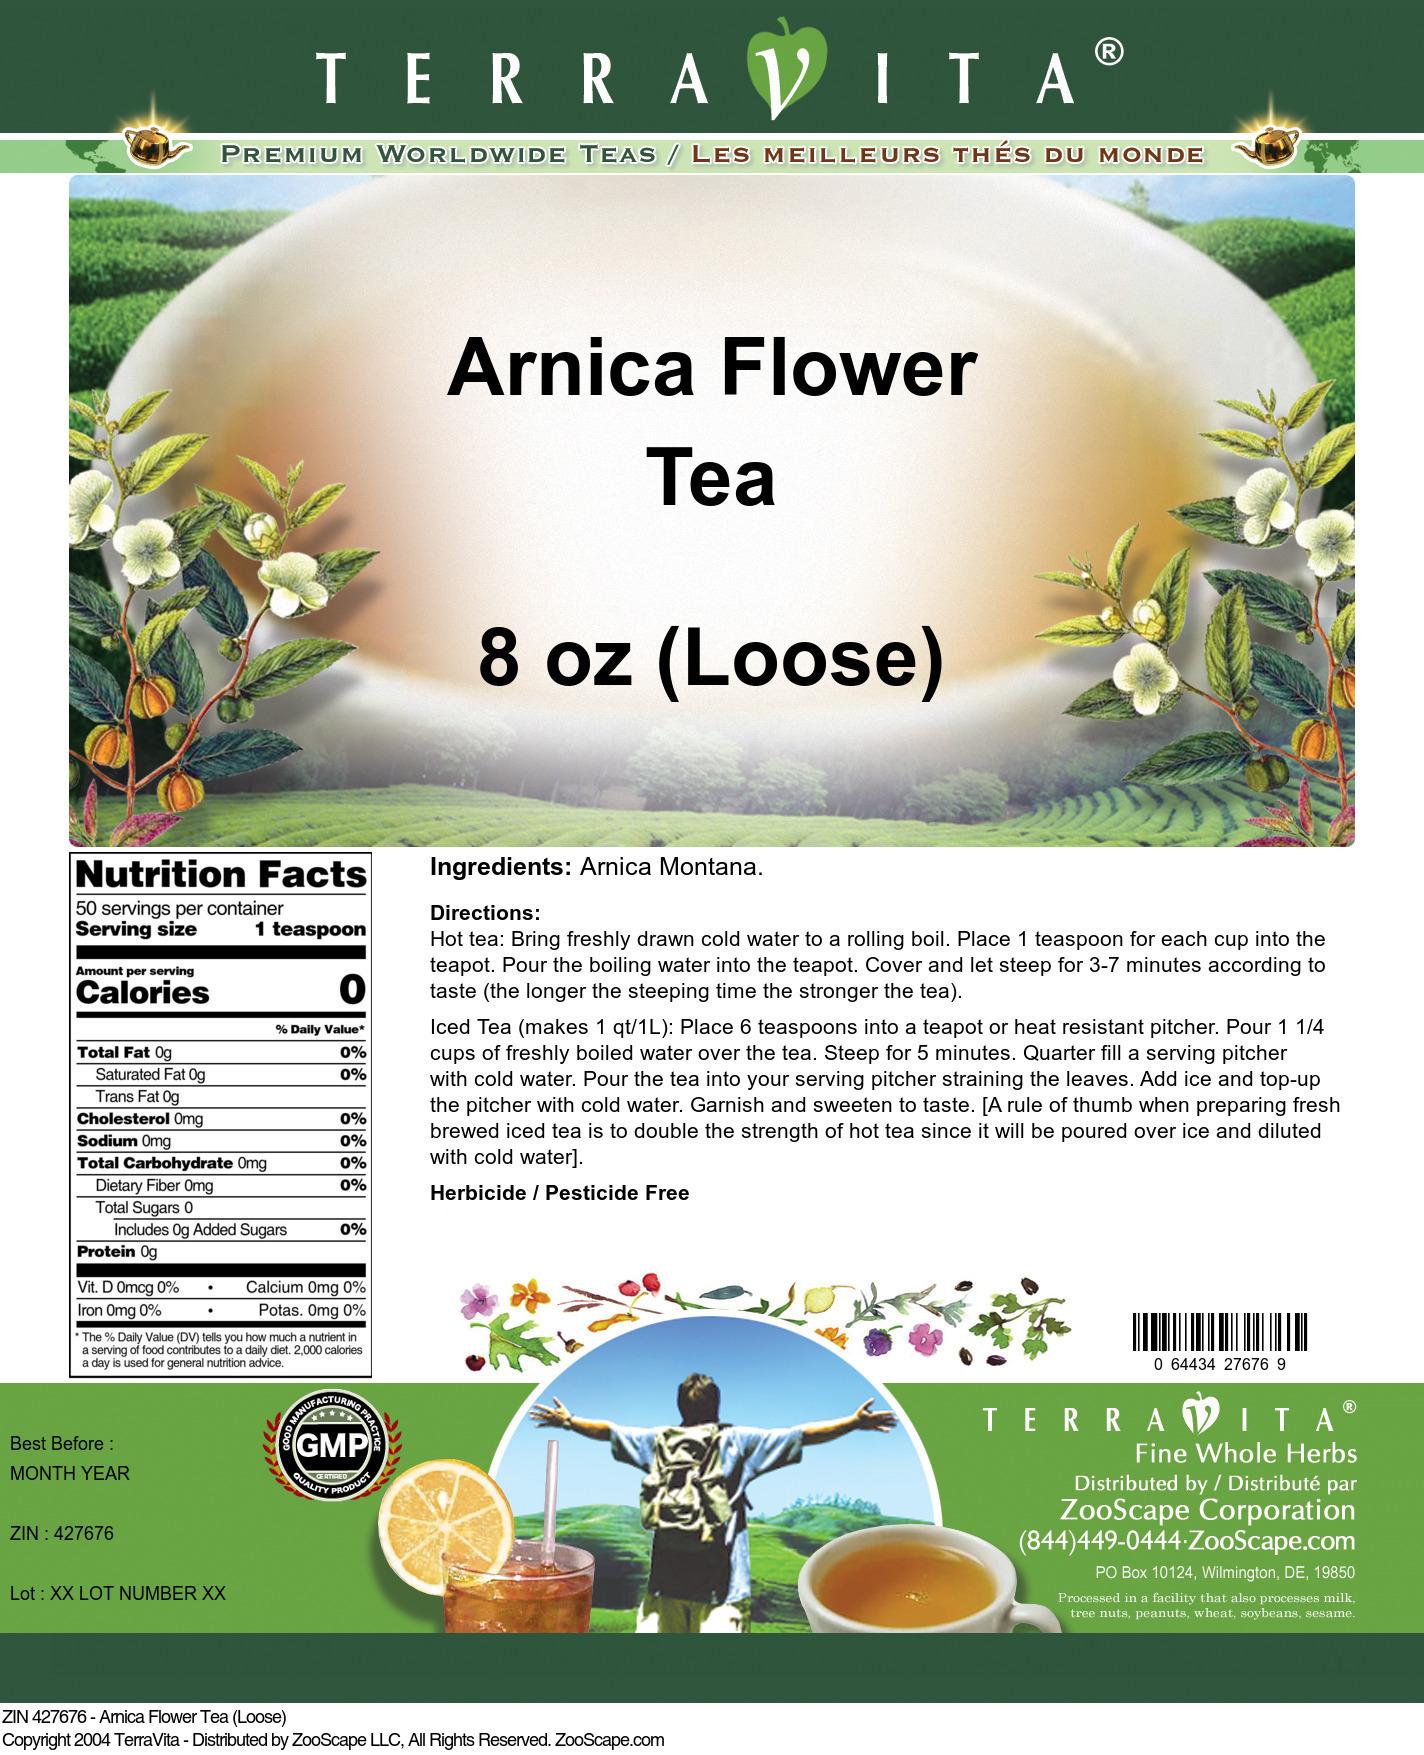 Arnica Flower Tea (Loose) - Label